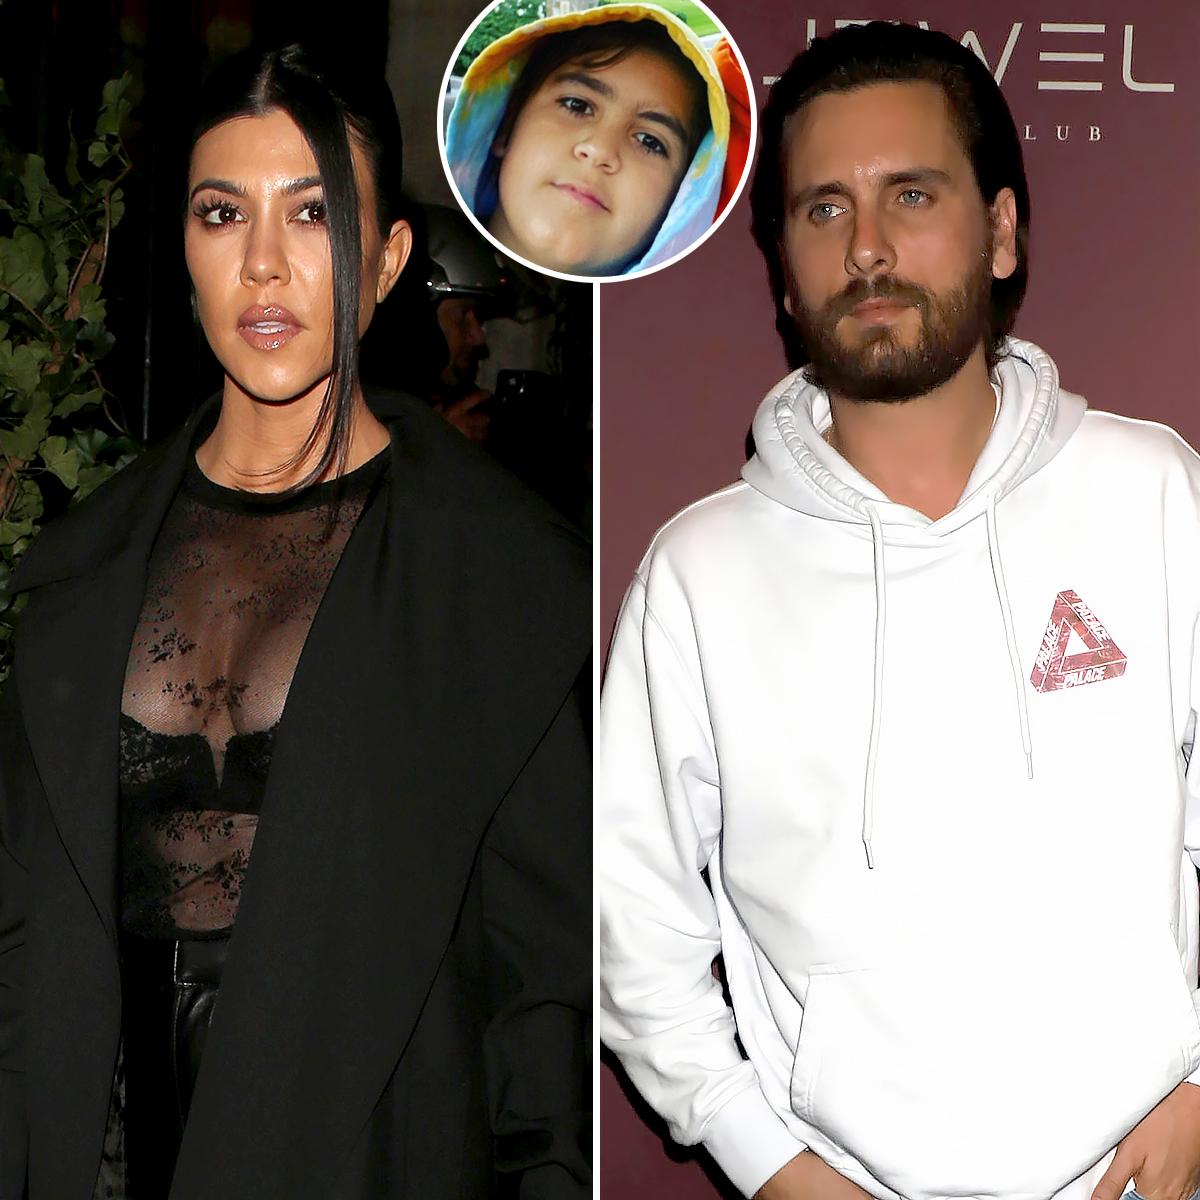 Kourtney Kardashian Confirms She and Ex Scott Disick Made Son Mason Delete Instagram